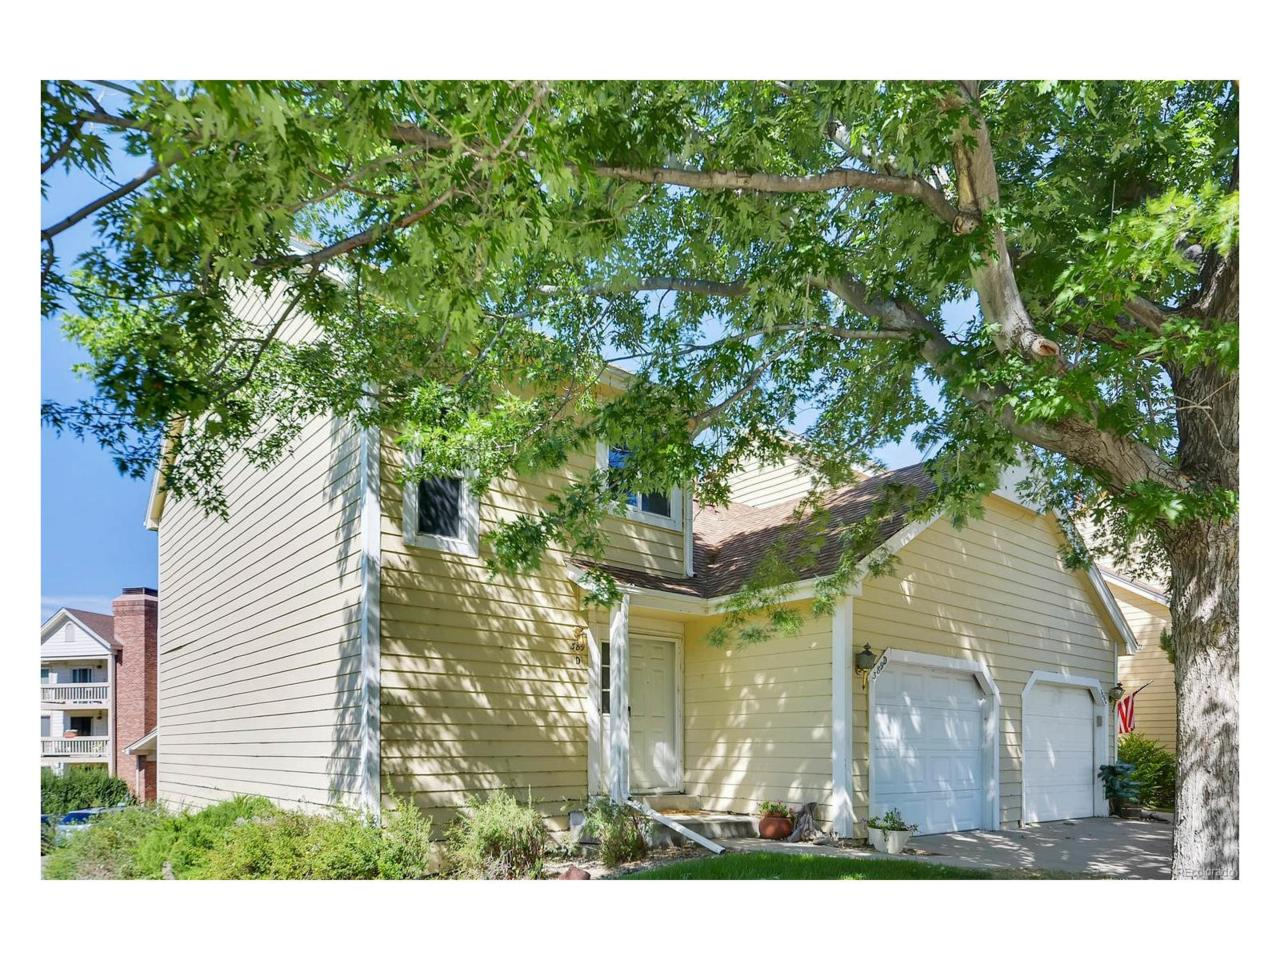 389 S Kalispell Way D, Aurora, CO 80017 (MLS #6101001) :: 8z Real Estate